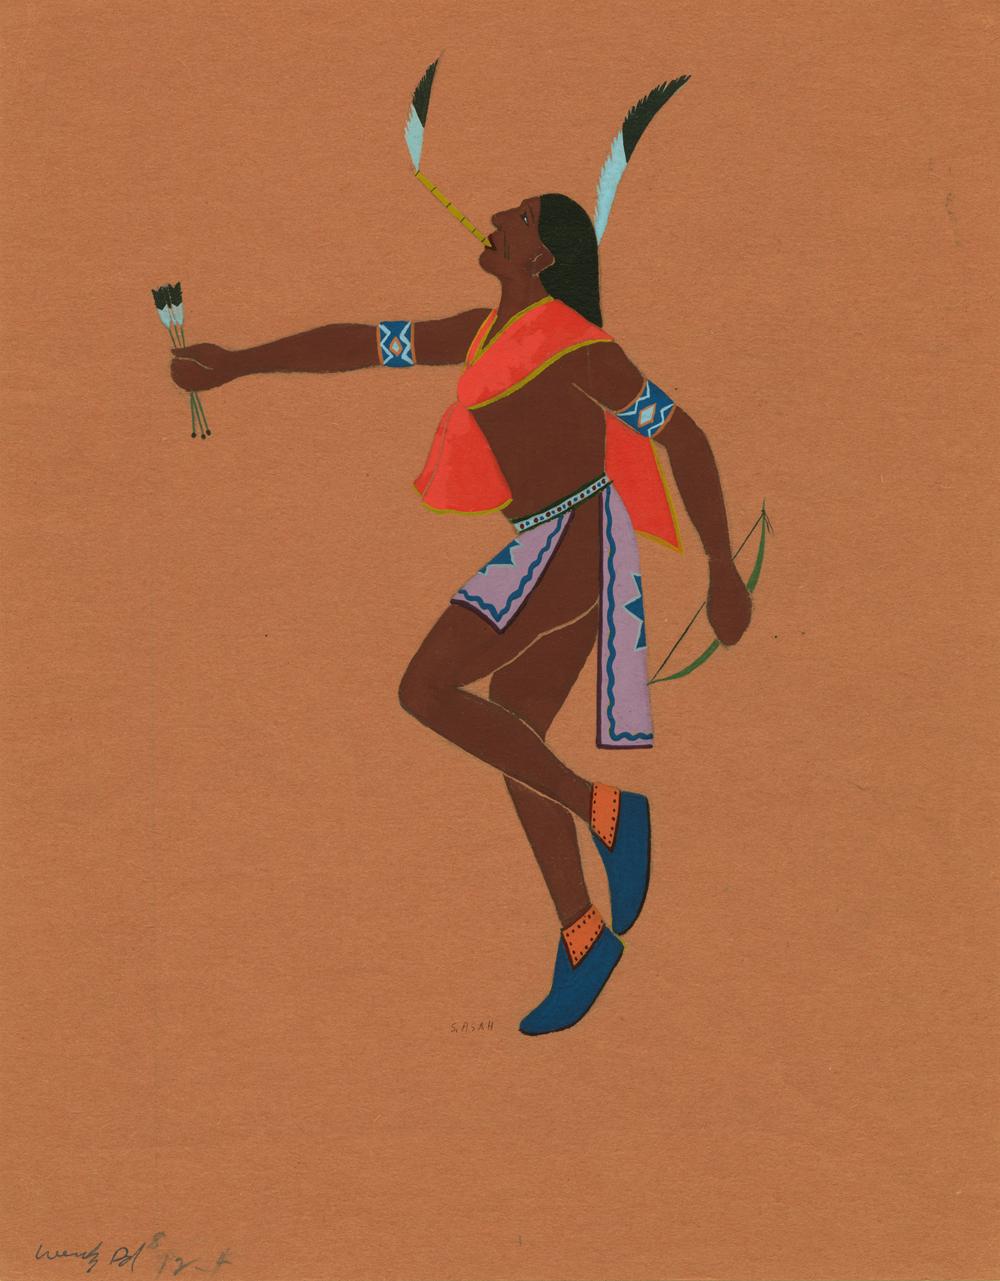 Kiowa Sun Dancer, c. 1930 by Spencer Asah, Kiowa. Tempera on paper 9 7/8 in. x 6 3/16 in. The Fred Jones Jr. Museum of Art, the University of Oklahoma.